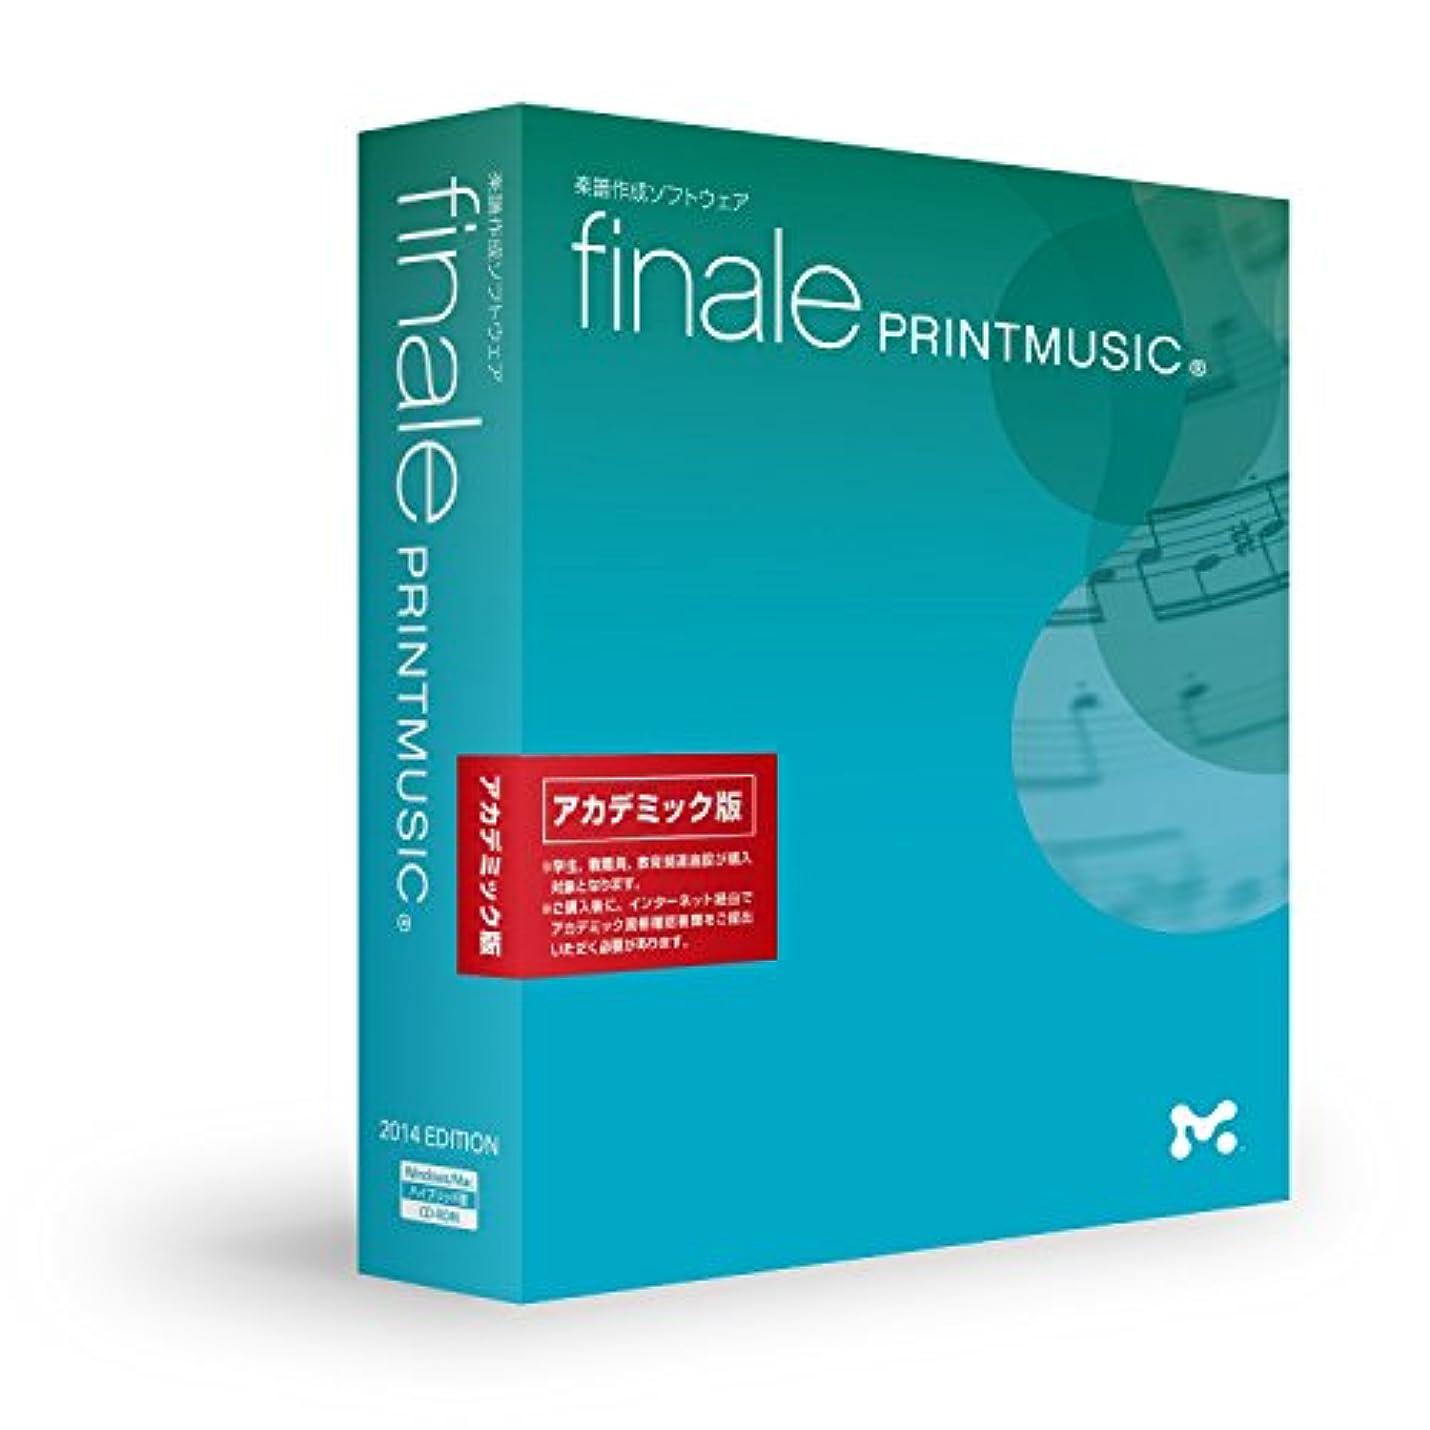 MakeMusic (メイクミュージック) Finale PrintMusic 2014 アカデミック版 (学生?教職員向け) 世界標準の楽譜作成ソフト【日本語版】